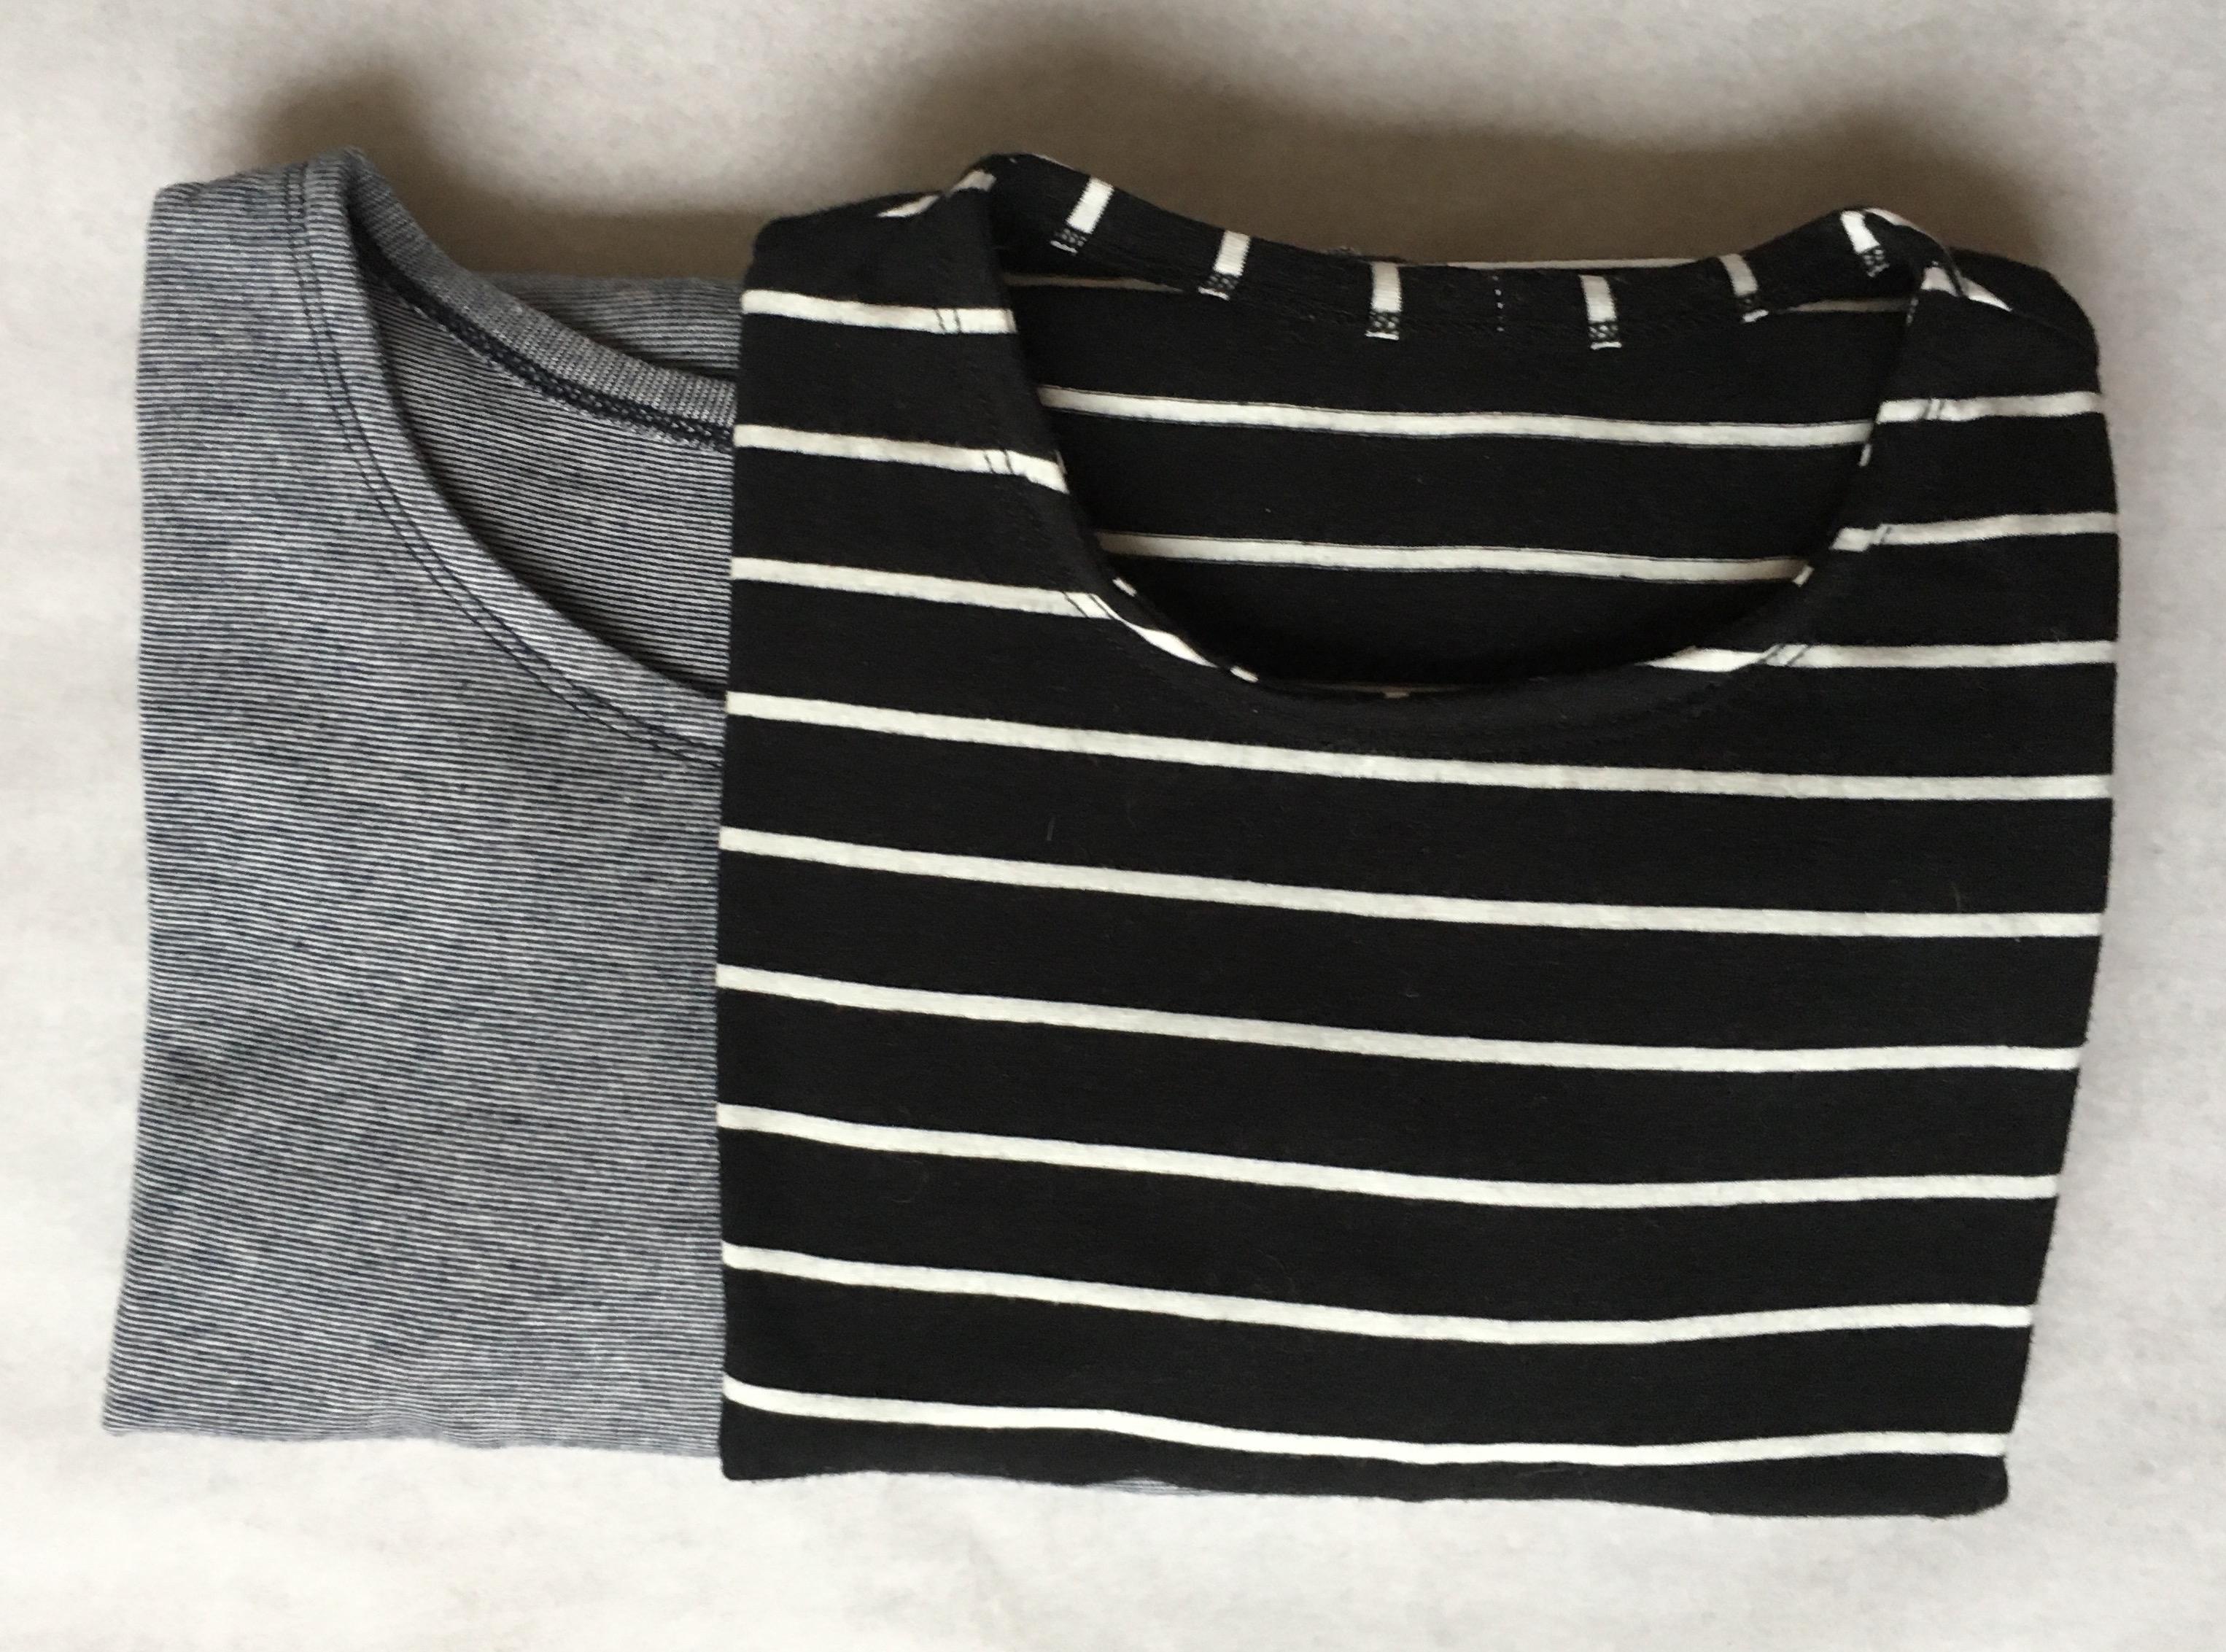 Tweede serie zelfgemaakte basic T-shirts